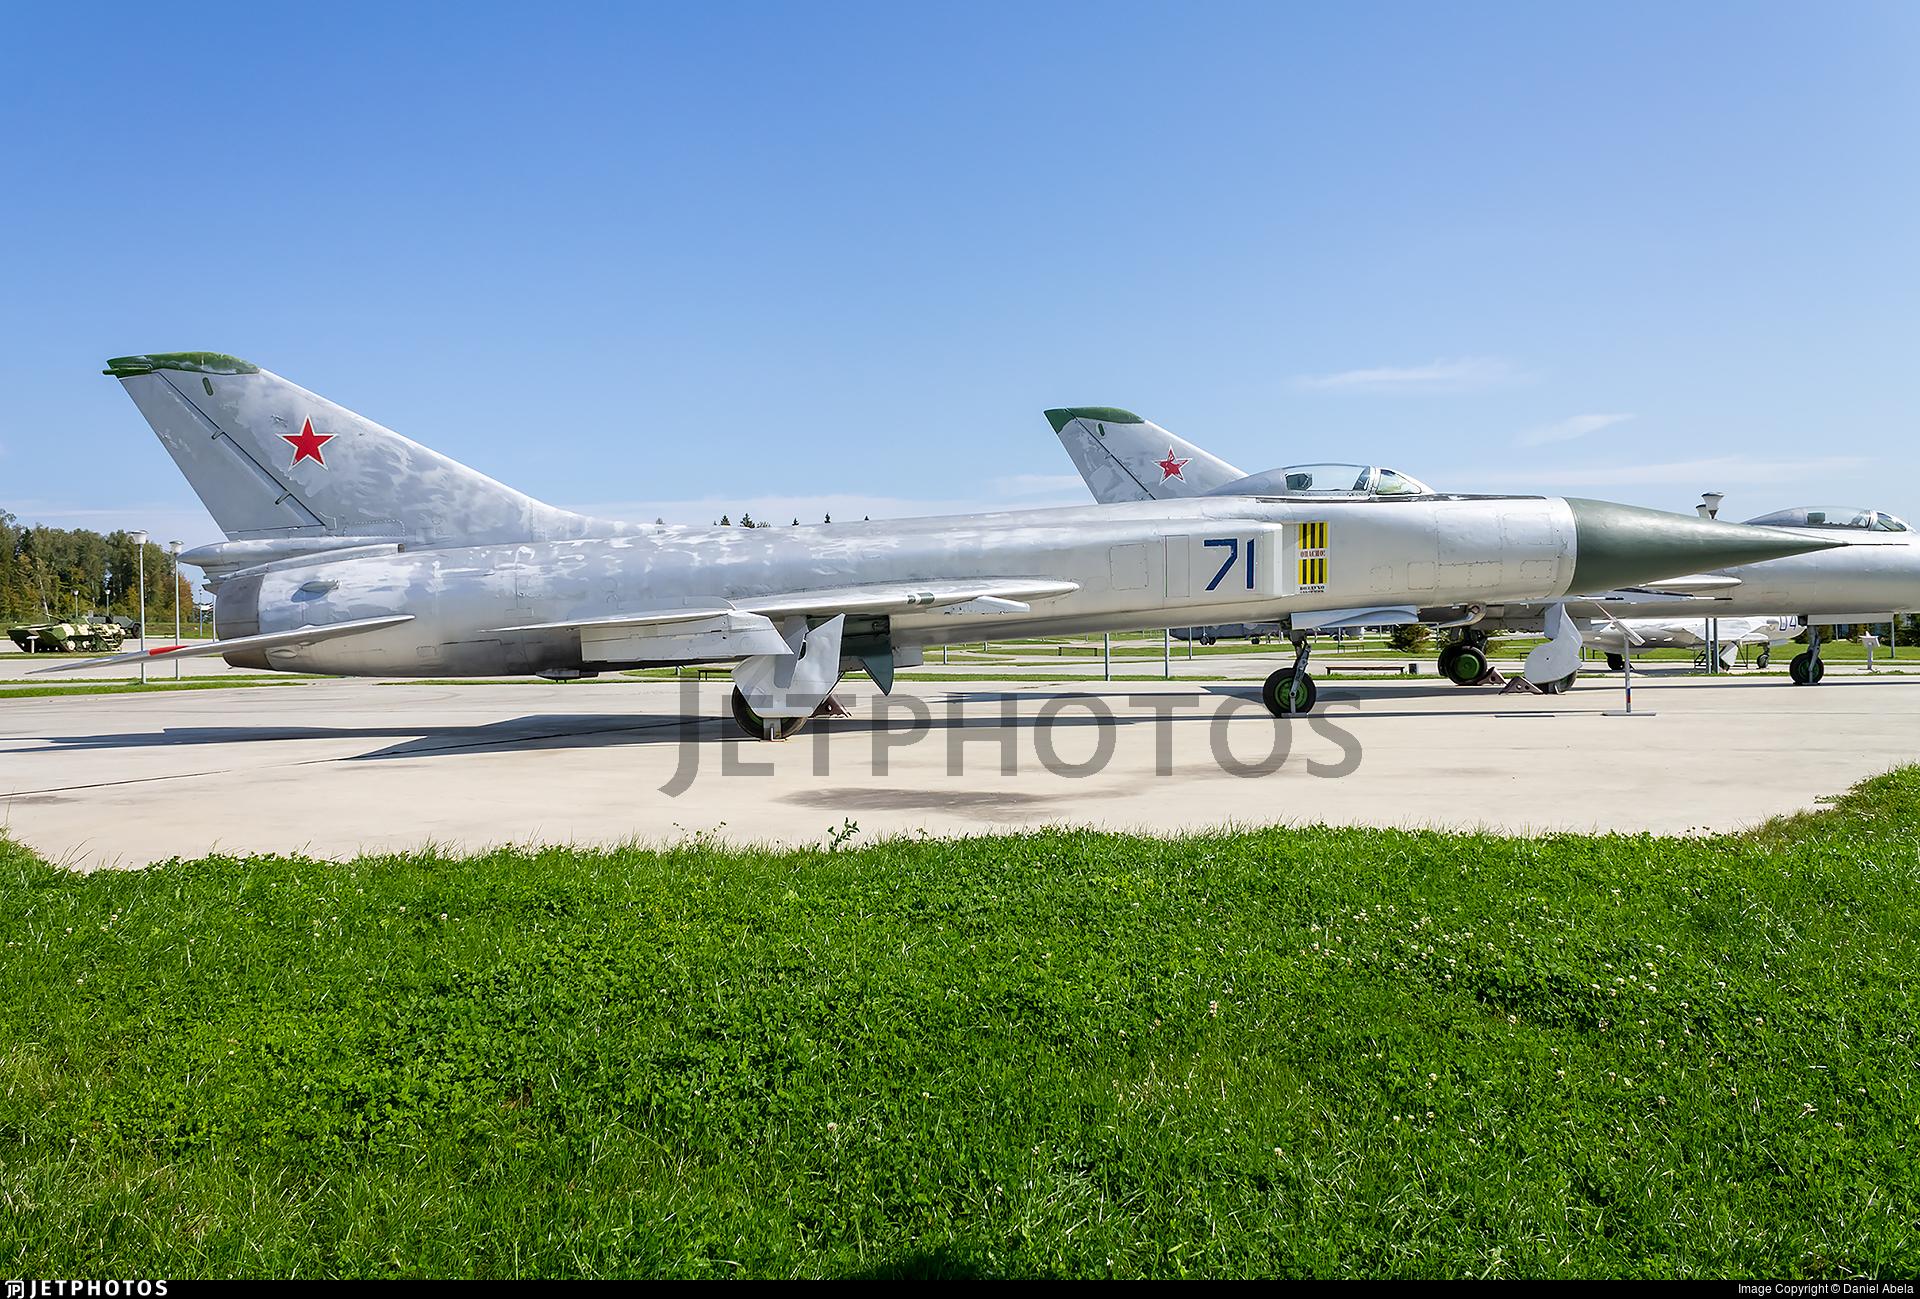 71 - Sukhoi Su-15T Flagon-E - Soviet Union - Air Force